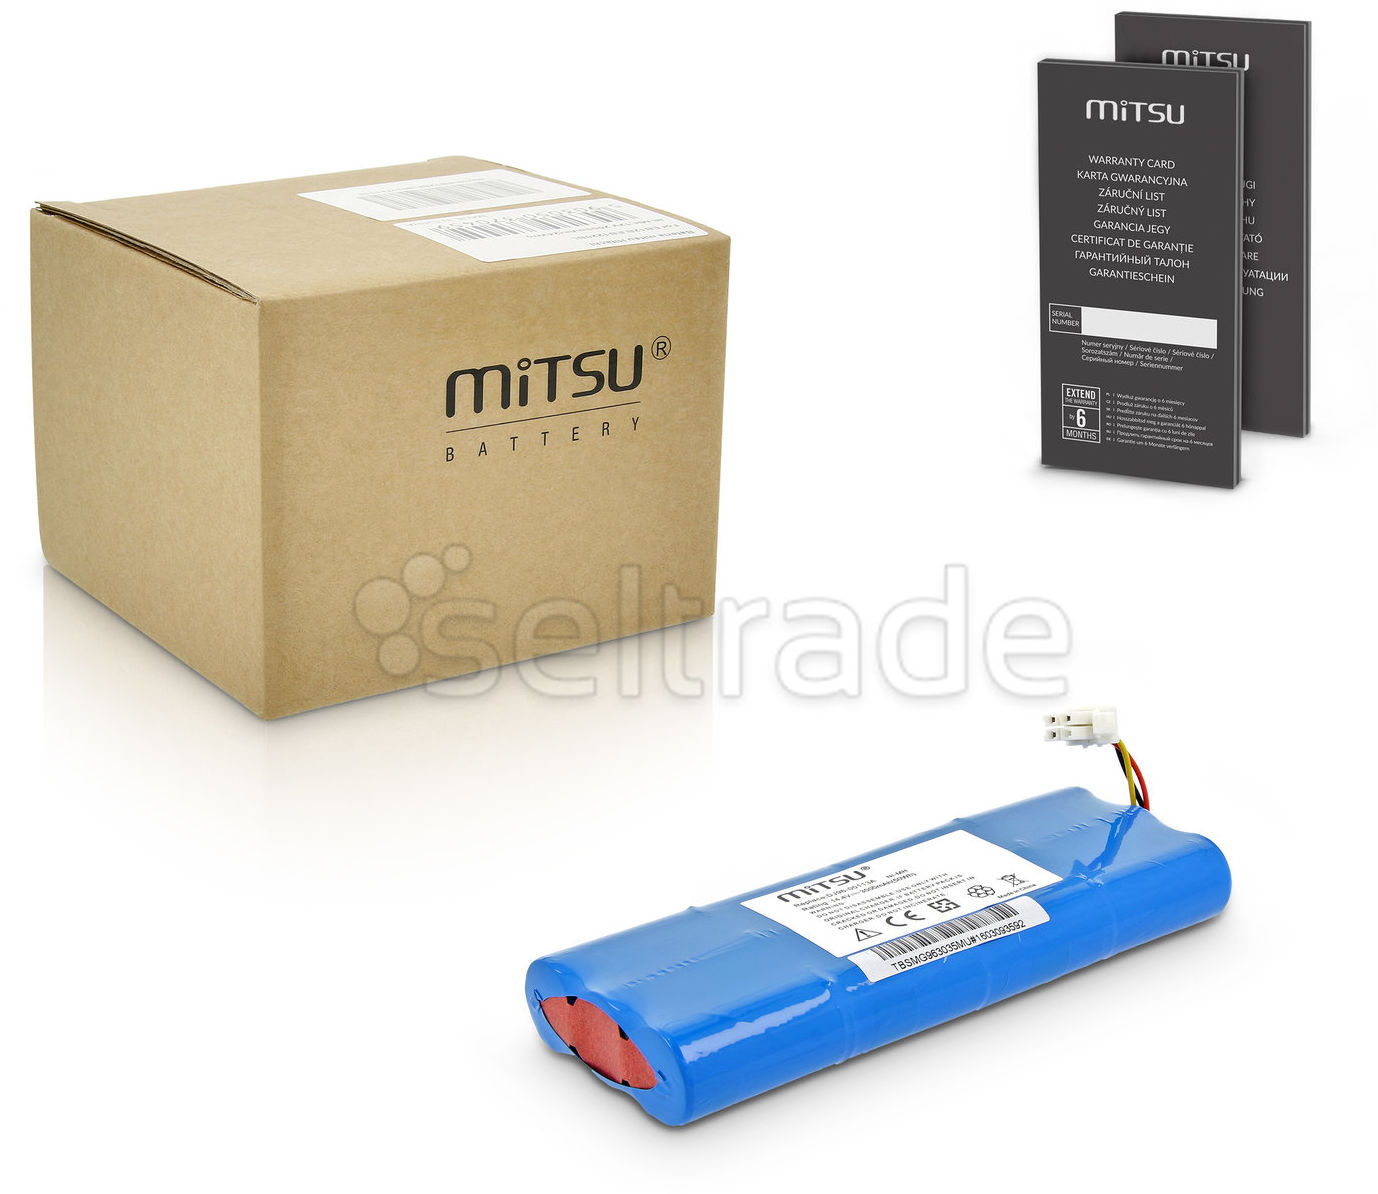 Bateria Mitsu do Samsung Navibot SR9630 3500mAh